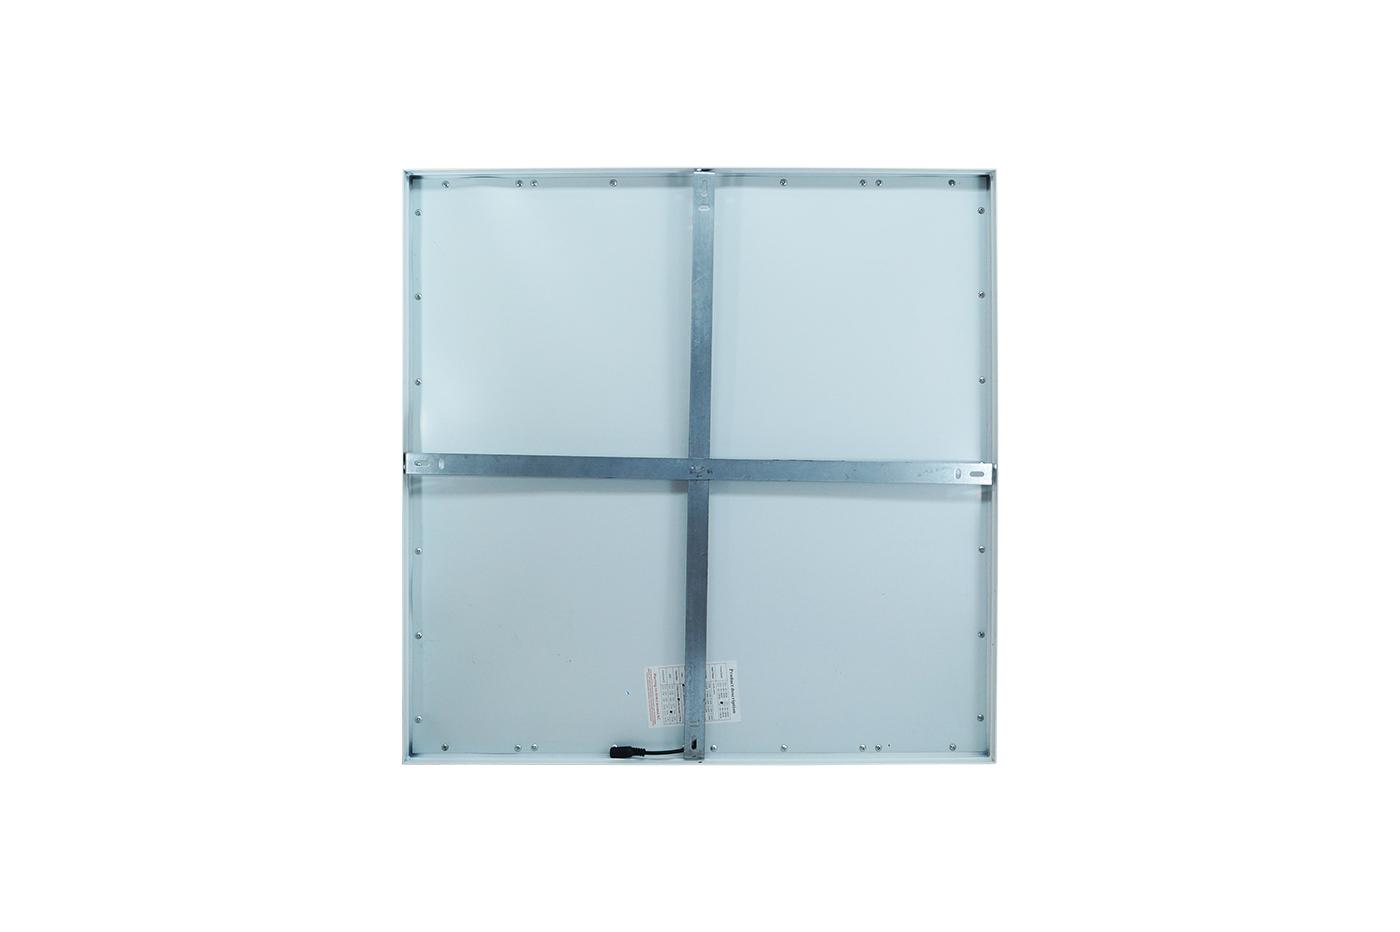 Plafoniere Led 60x60 : Bes plafoniere beselettronica pannello led w